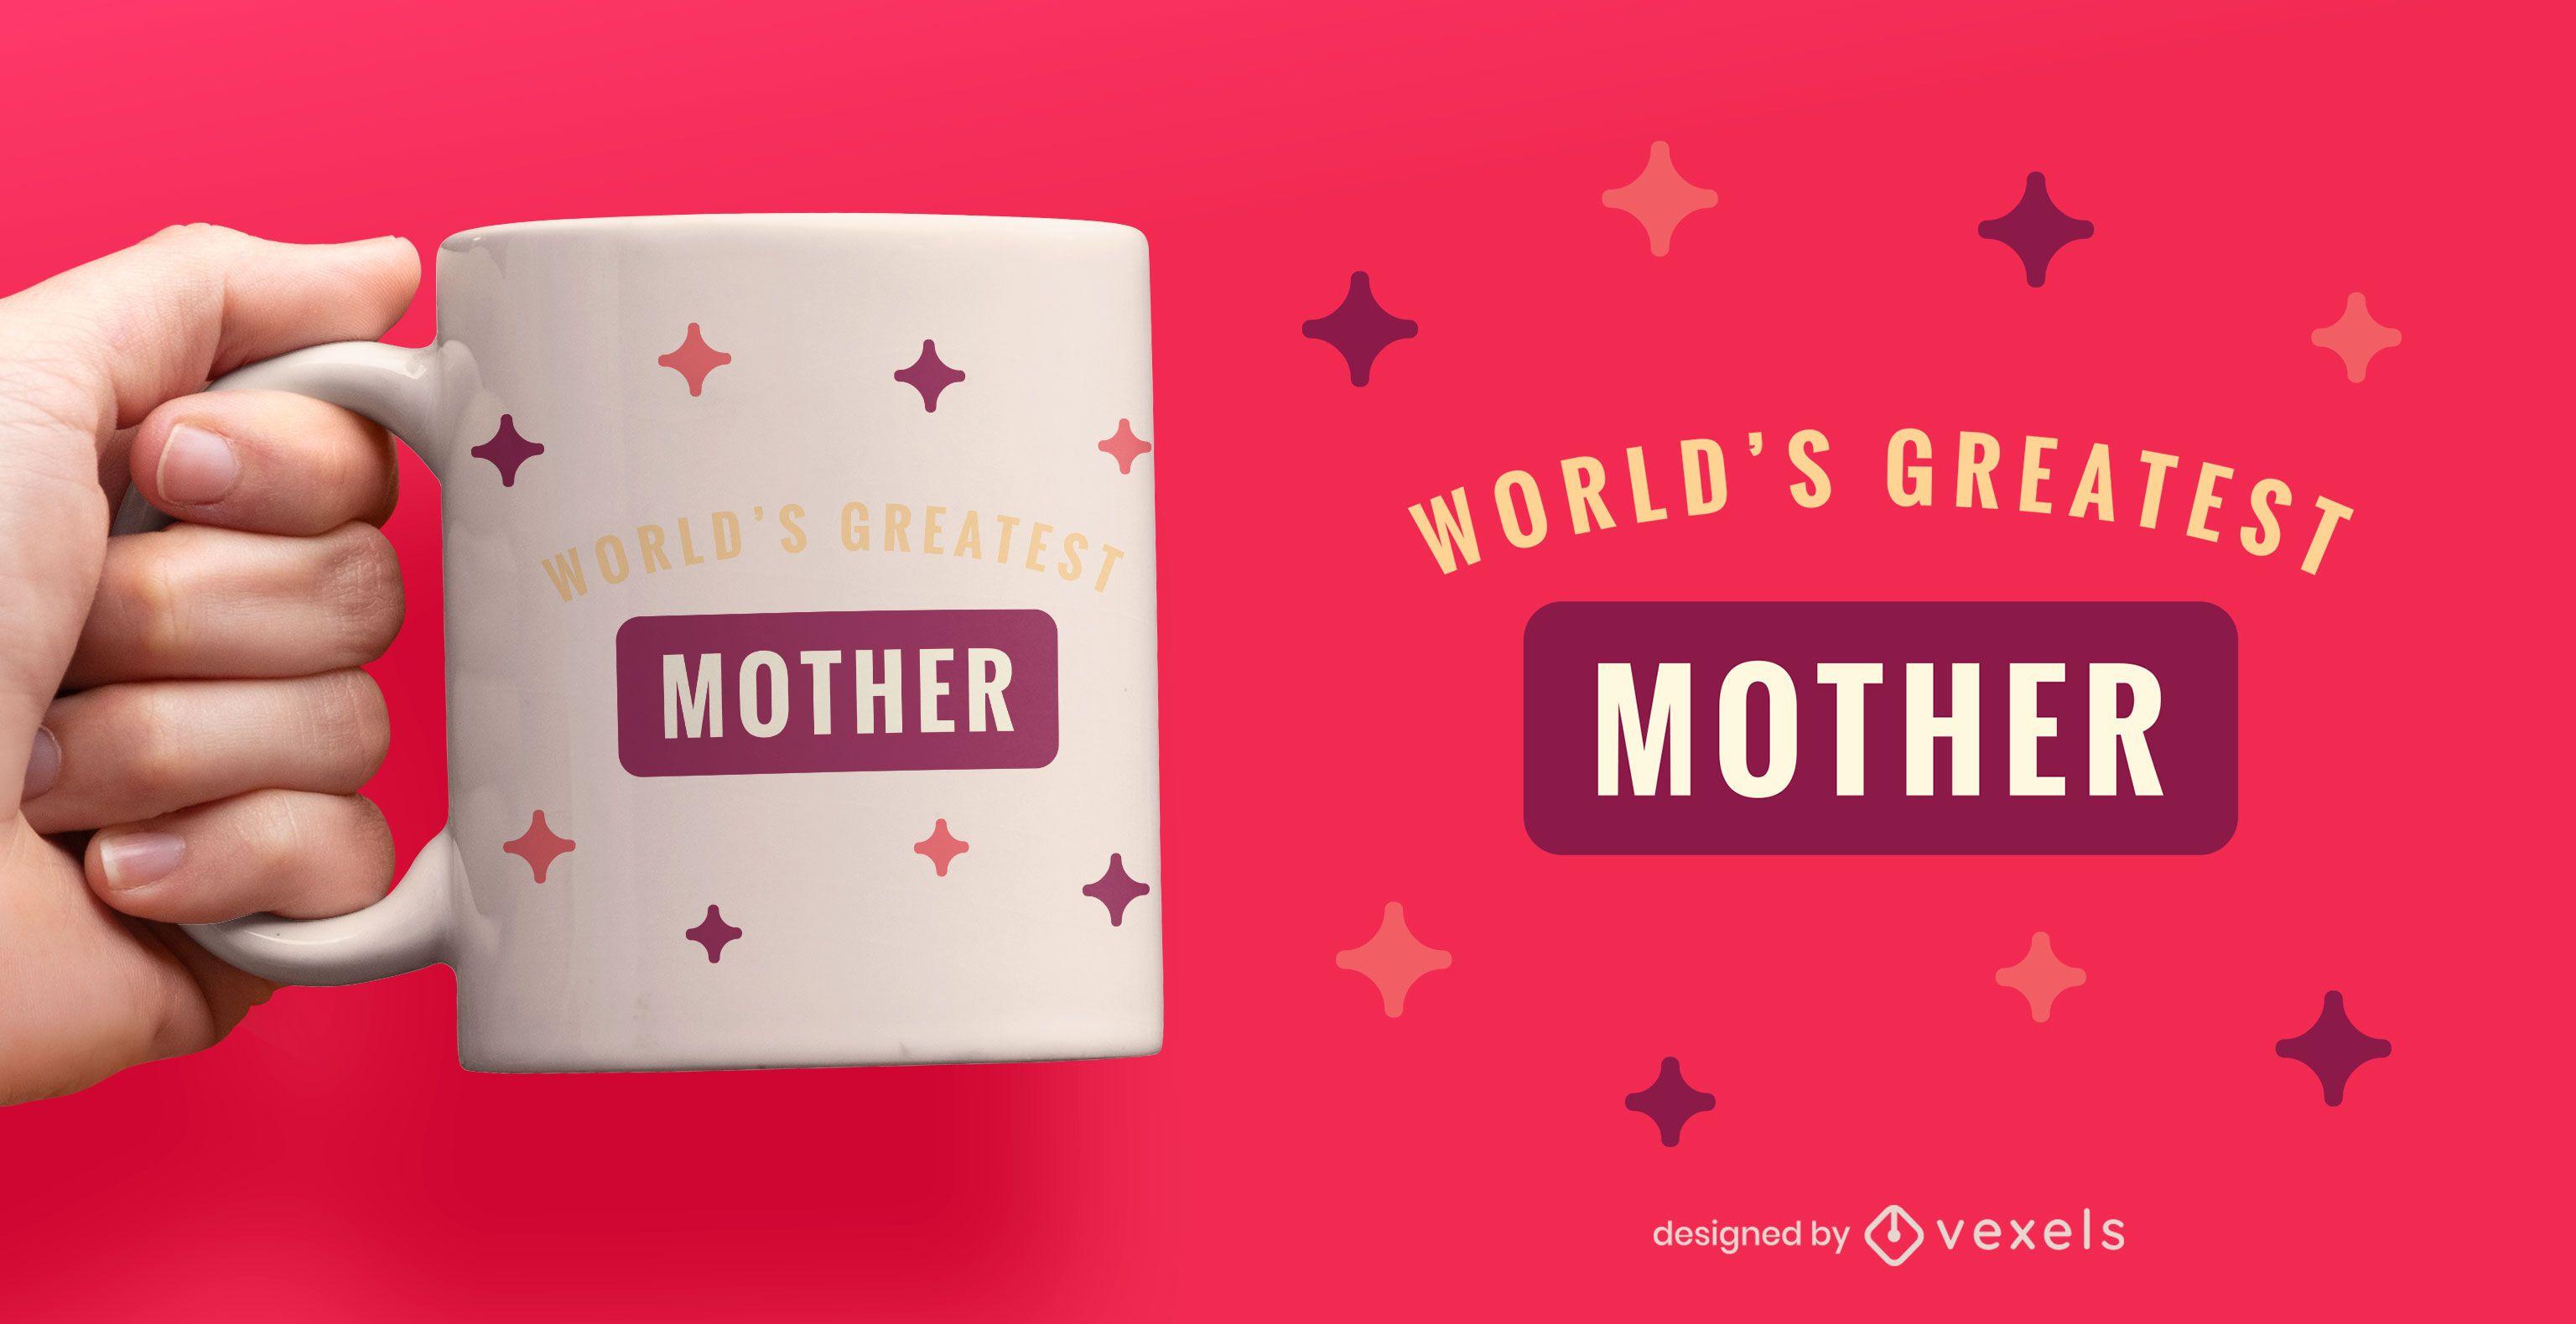 World's greatest mother flat mug design